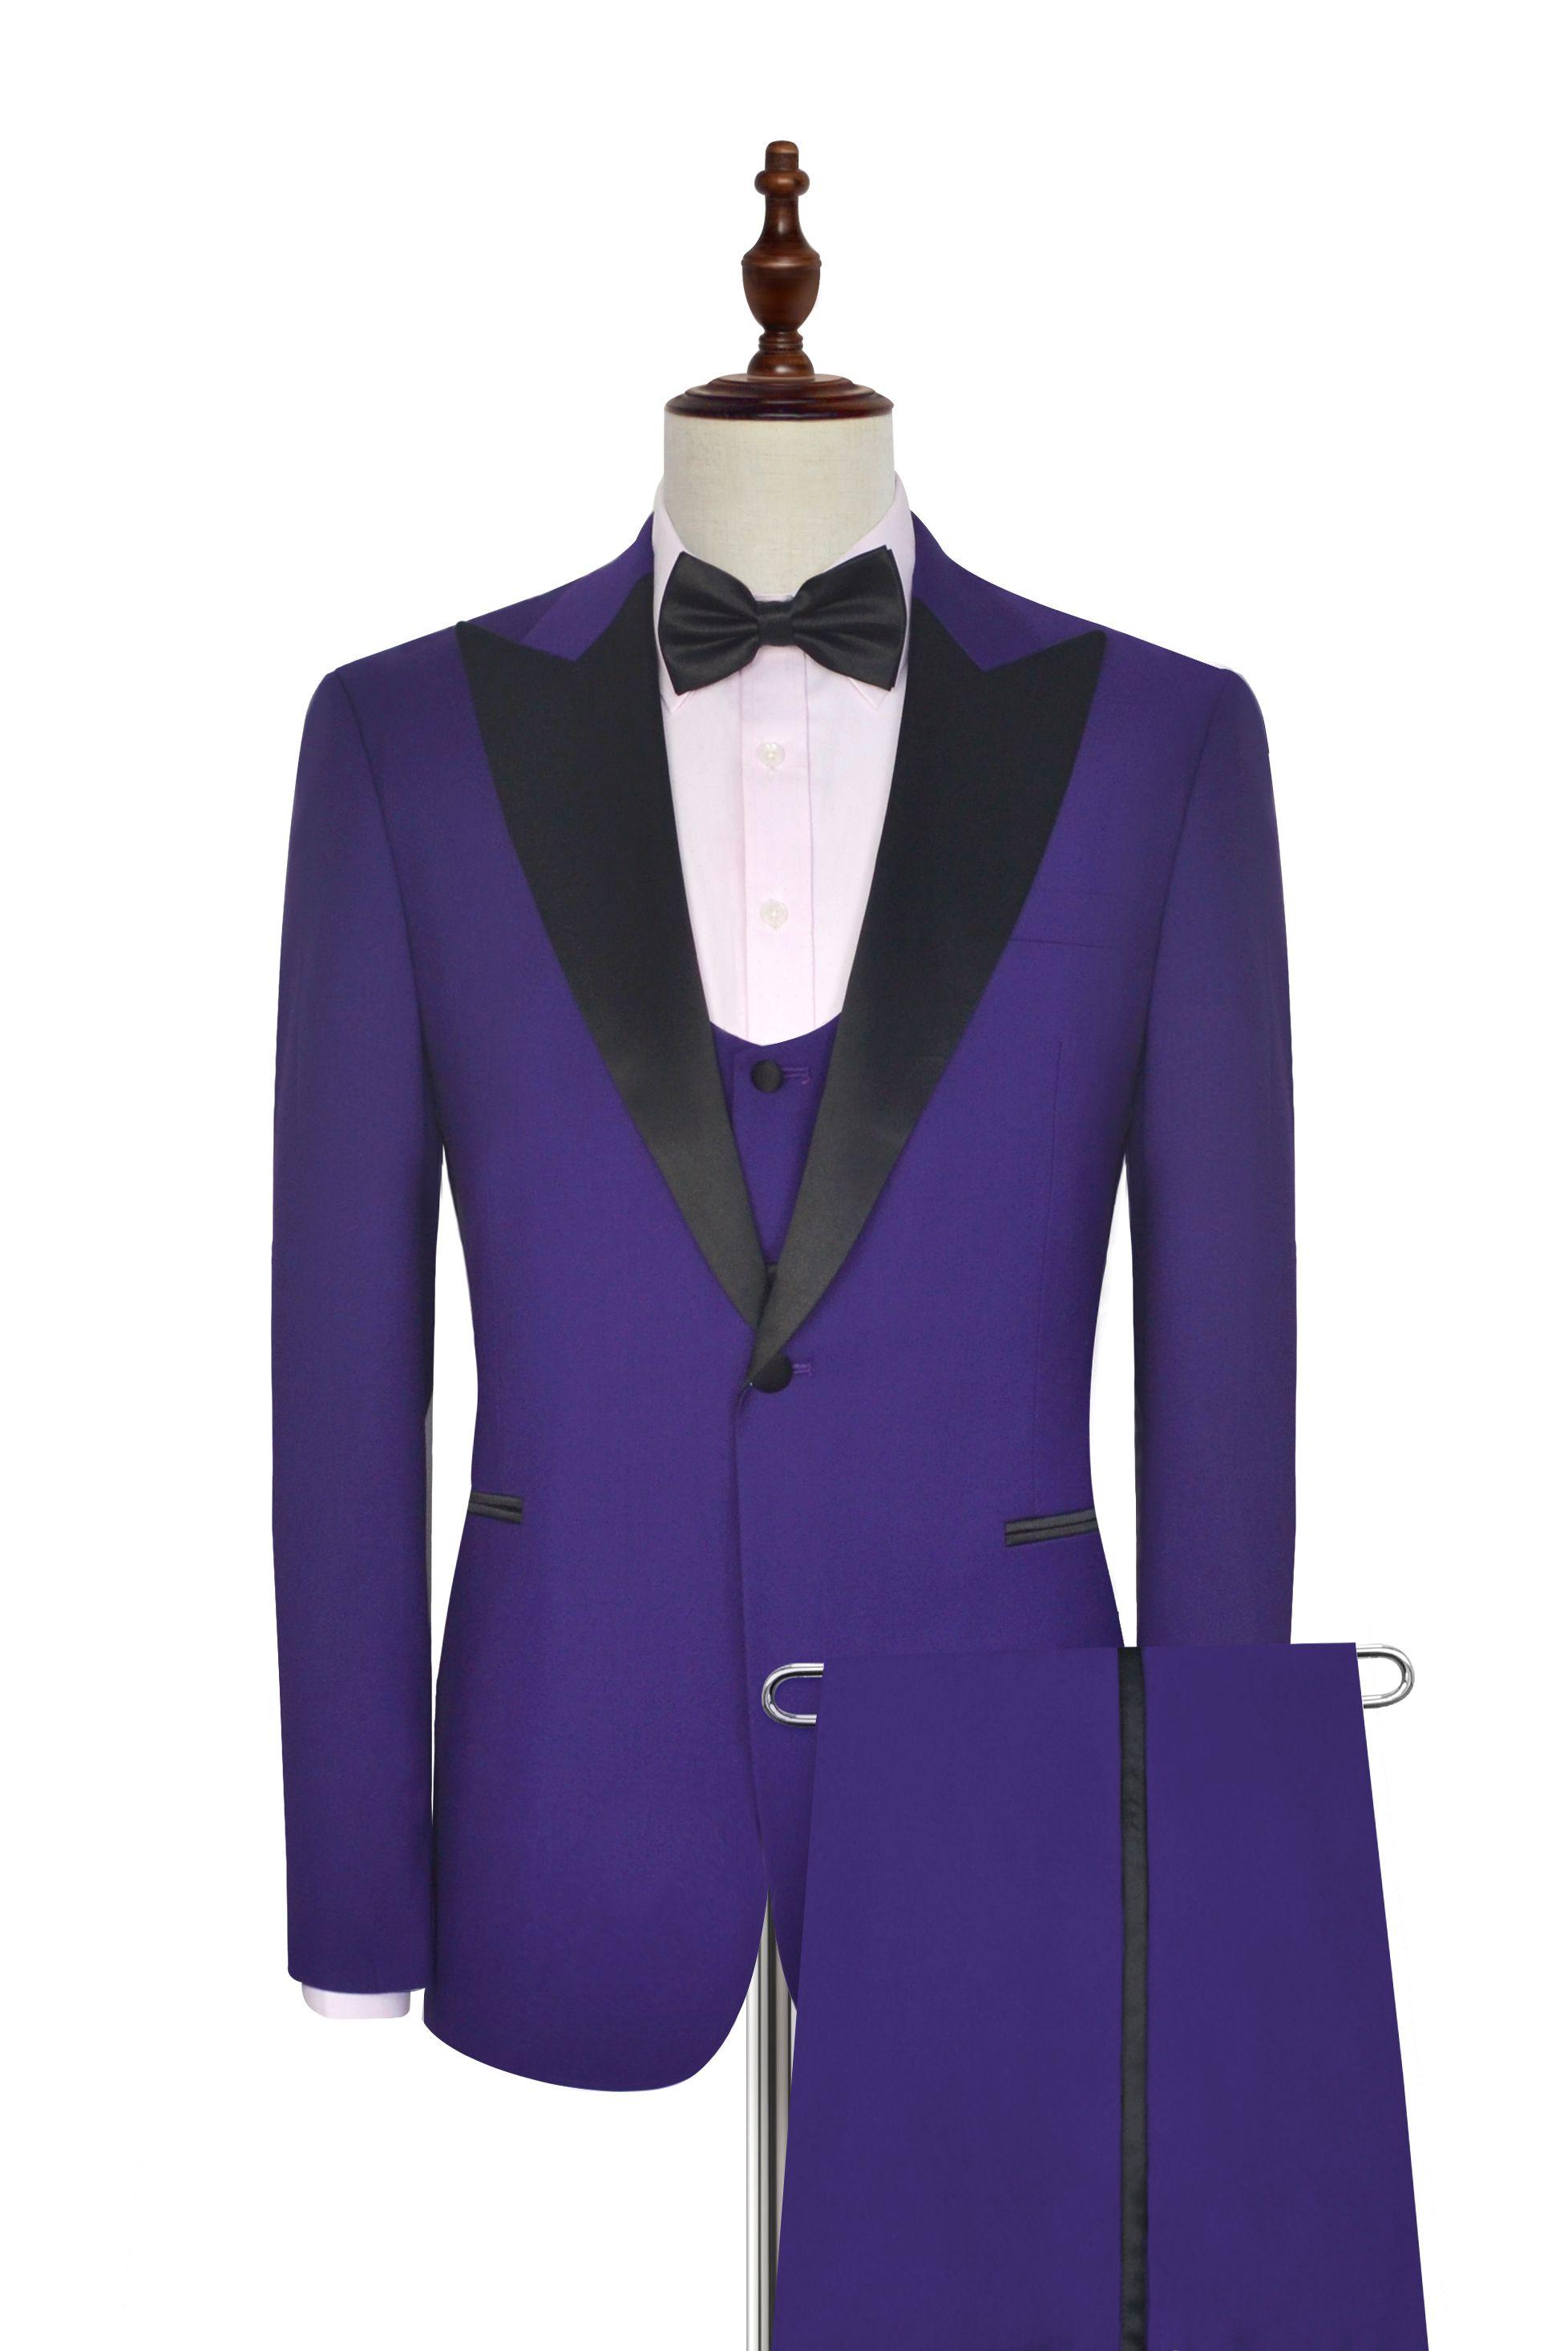 black collar wool Peak lapel three-piece wedding suit for groom